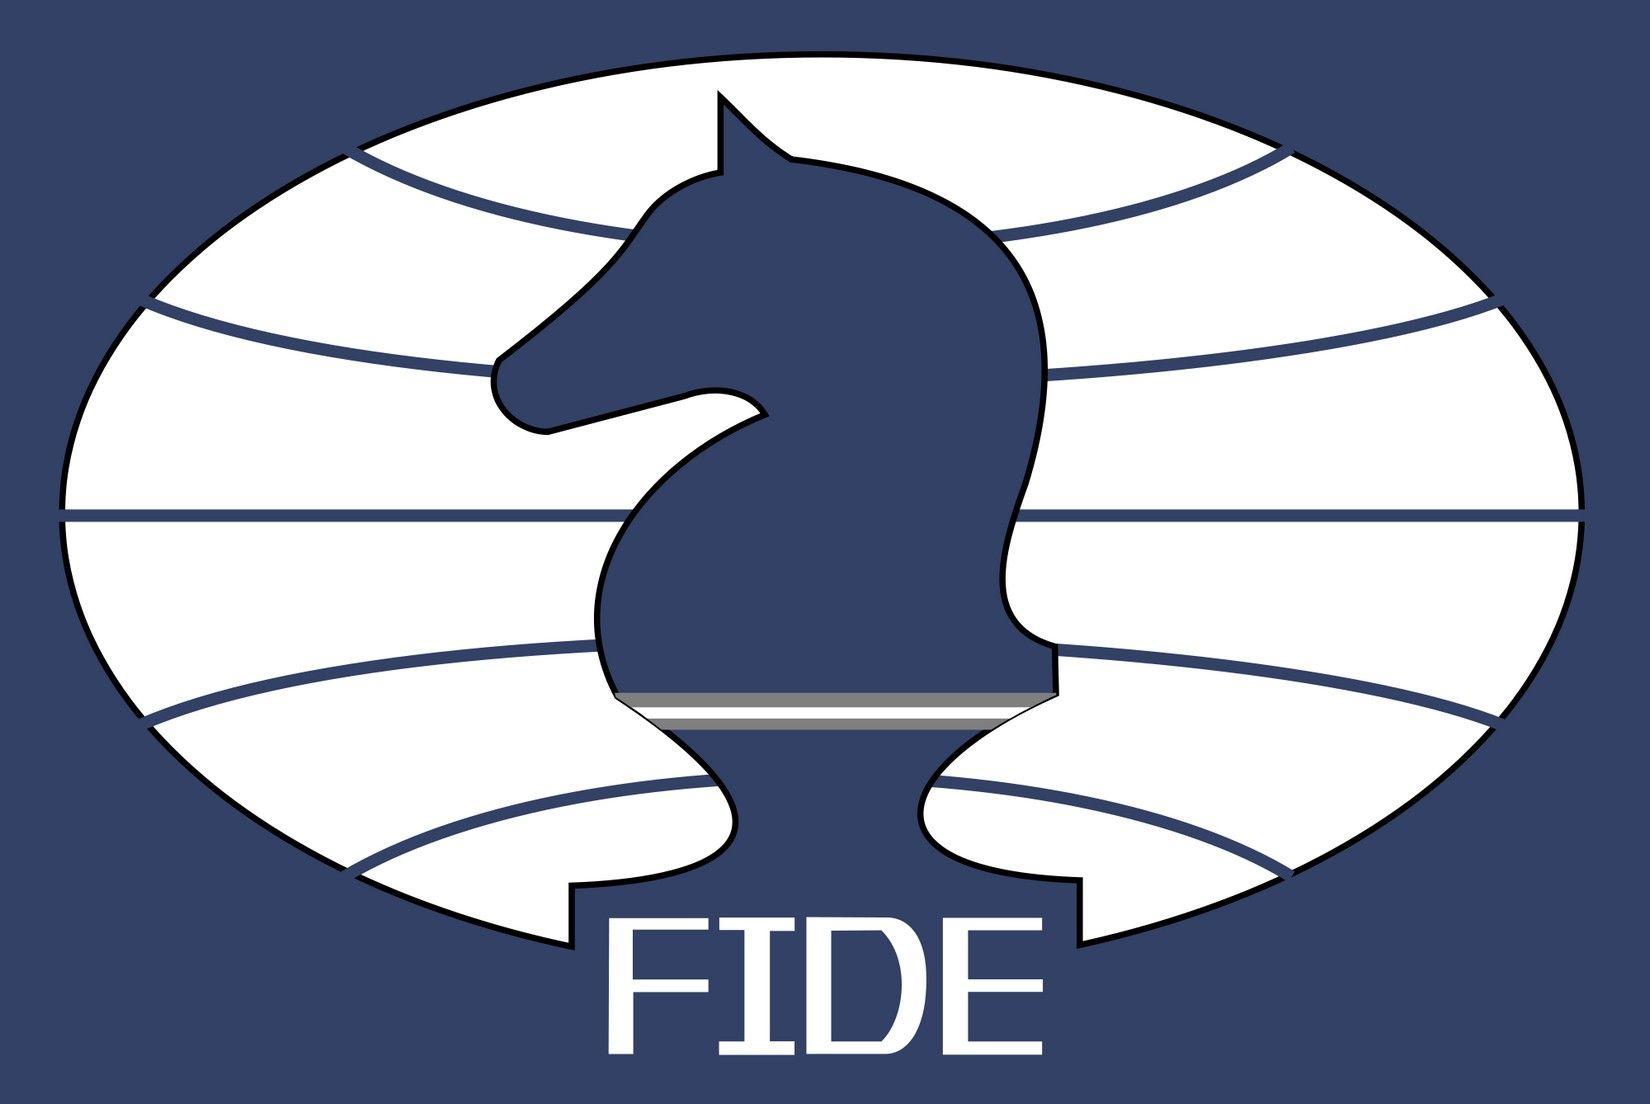 fide � world chess federation logo eps file arisf